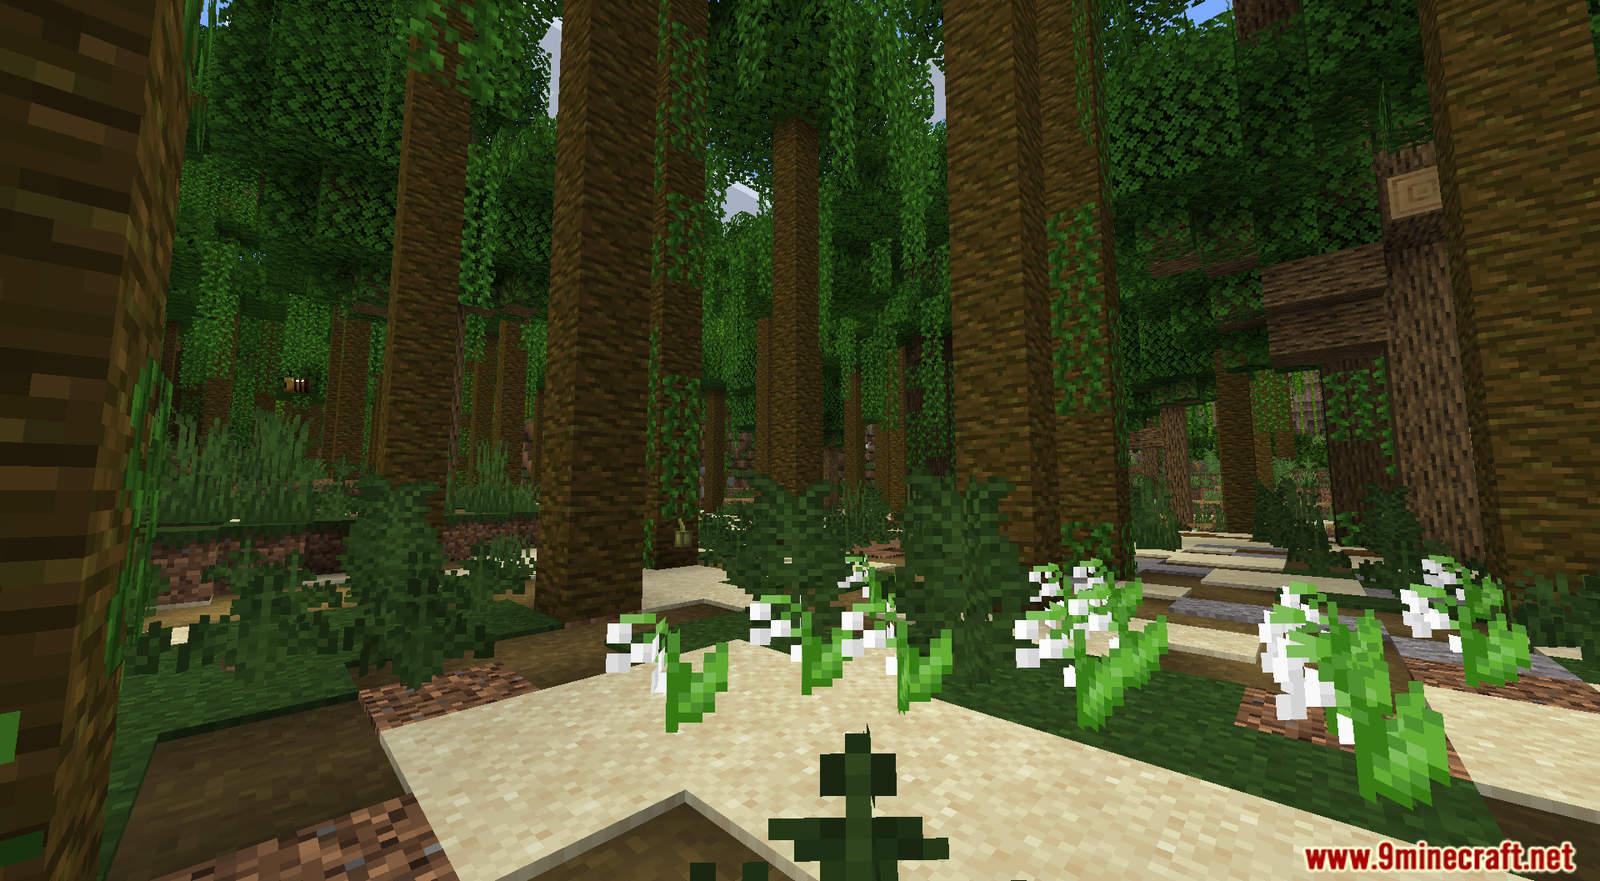 William Wythers' Overhauled Overworld Mod for Minecraft (22)